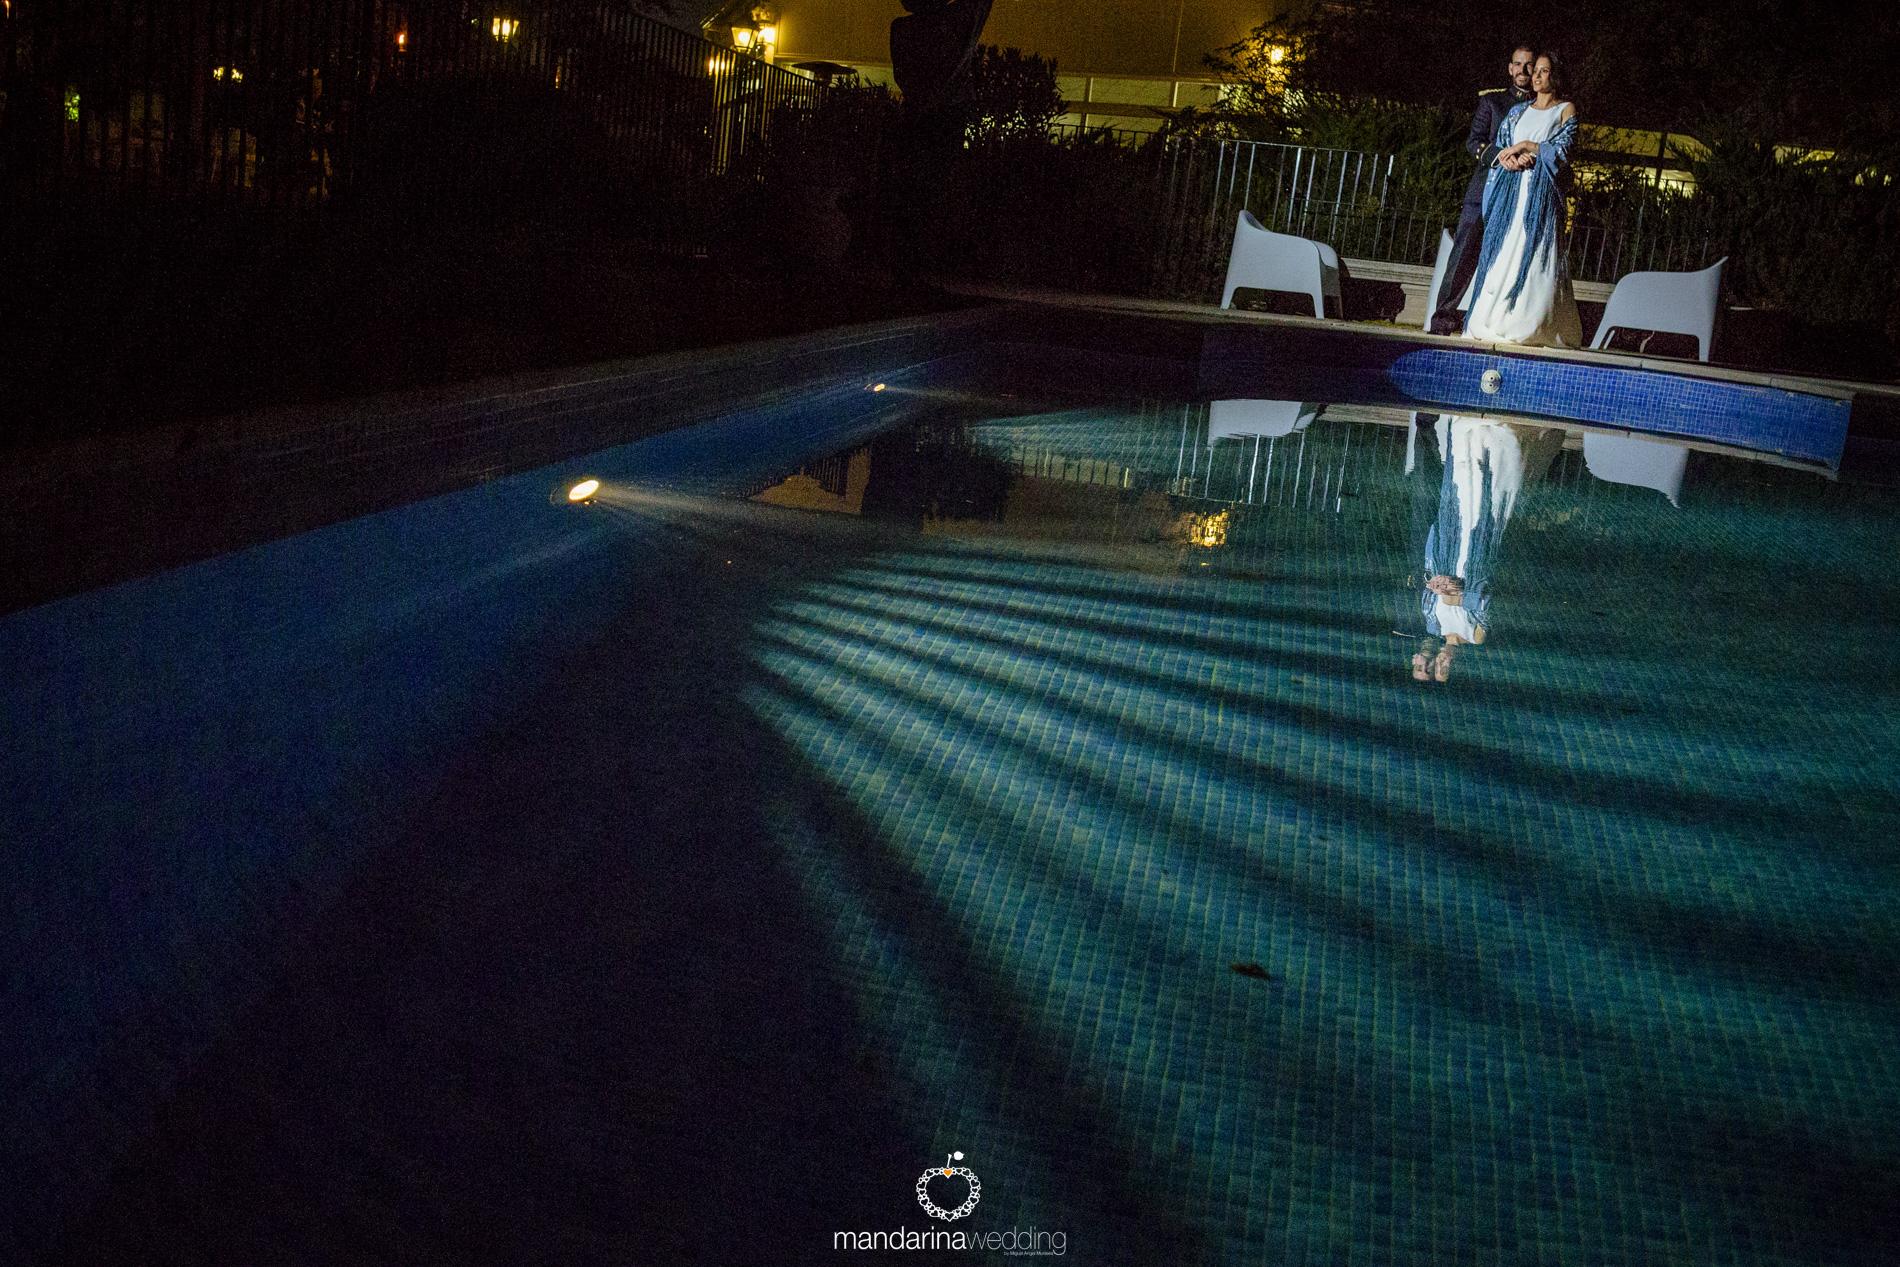 mandarina wedding, fotografos de boda, fotografo boda soria, fotografo boda barcelona, fotografo boda Madrid, fotógrafo boda lerida_37